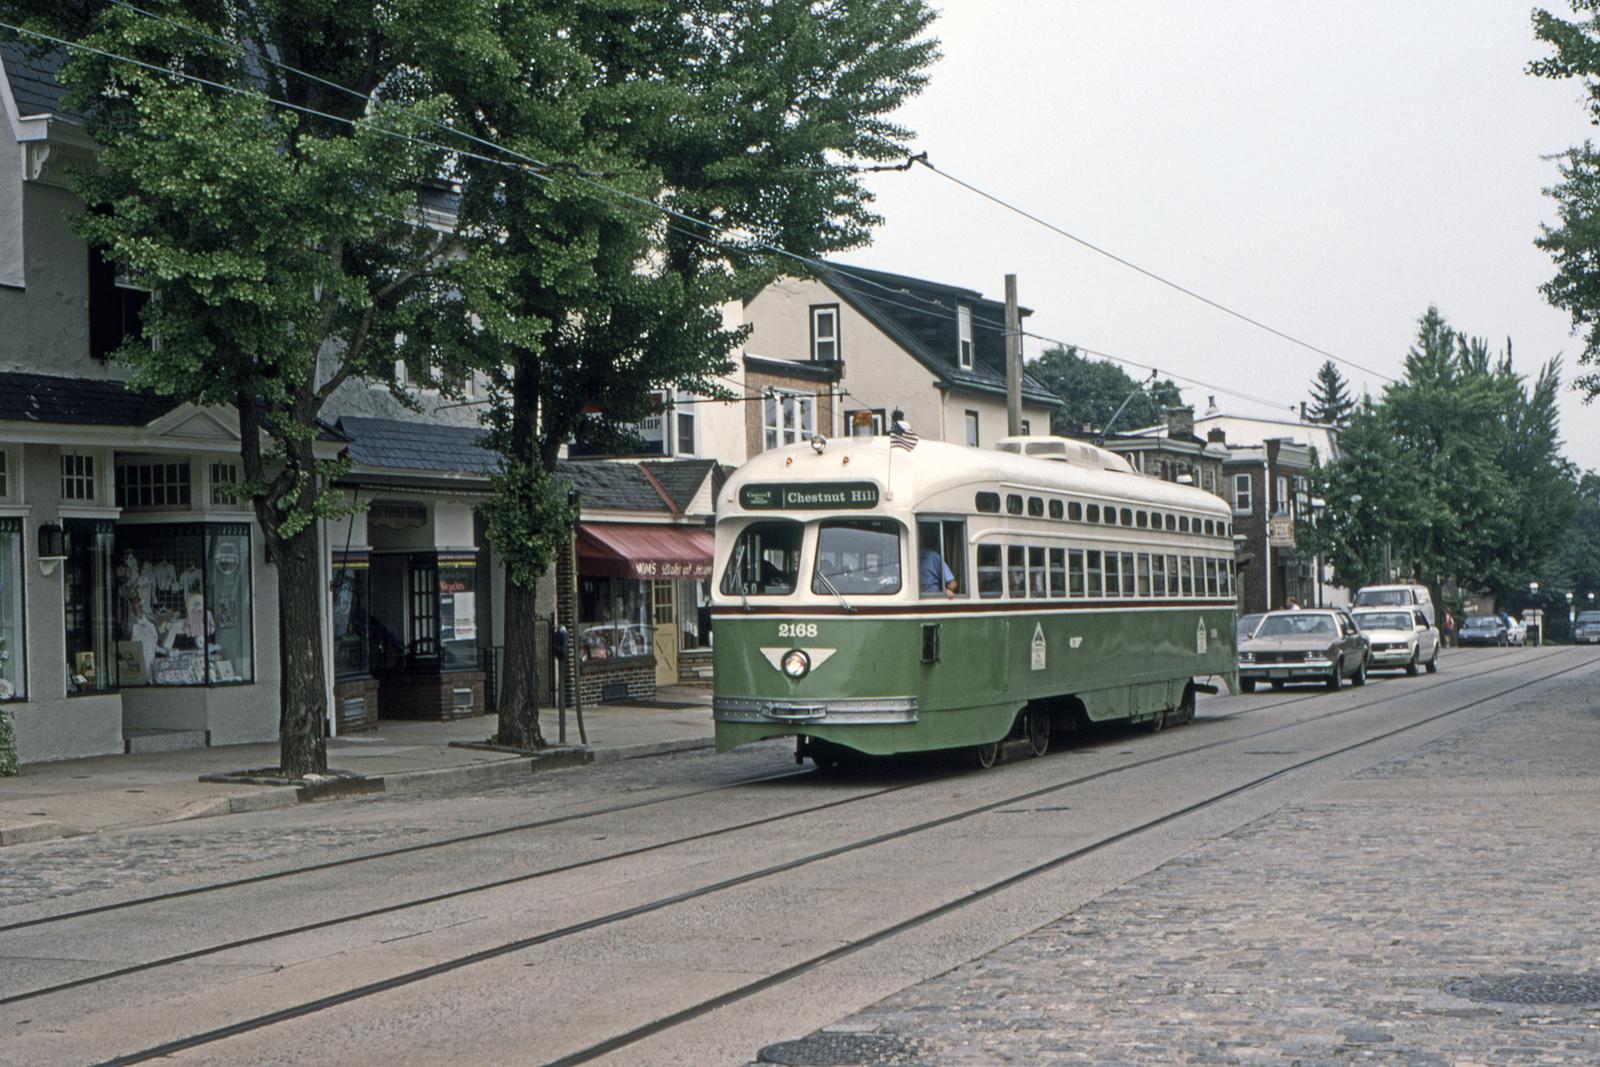 (895k, 1600x1067)<br><b>Country:</b> United States<br><b>City:</b> Philadelphia, PA<br><b>System:</b> SEPTA (or Predecessor)<br><b>Line:</b> Rt. 23-Germantown<br><b>Location:</b> Germantown/Hartwell<br><b>Car:</b> PTC/SEPTA Postwar All-electric PCC (St.Louis, 1948) 2168 <br><b>Collection of:</b> David Pirmann<br><b>Date:</b> 1993<br><b>Viewed (this week/total):</b> 0 / 47